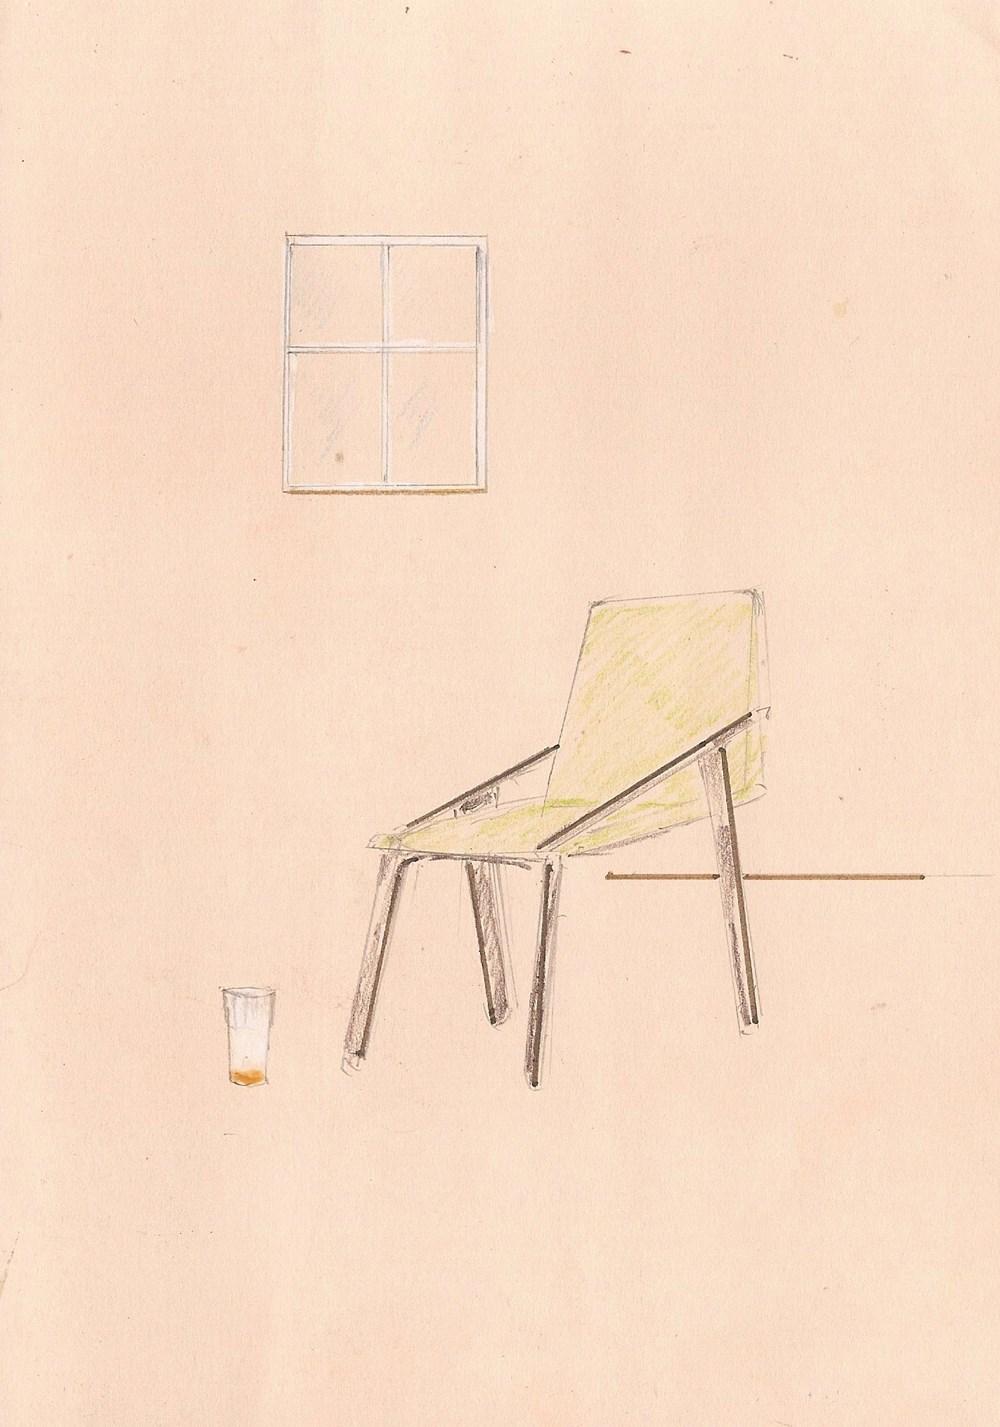 Studio Sale | Alexander Glass - Lot 20, Alexander Glass, Online Furniture